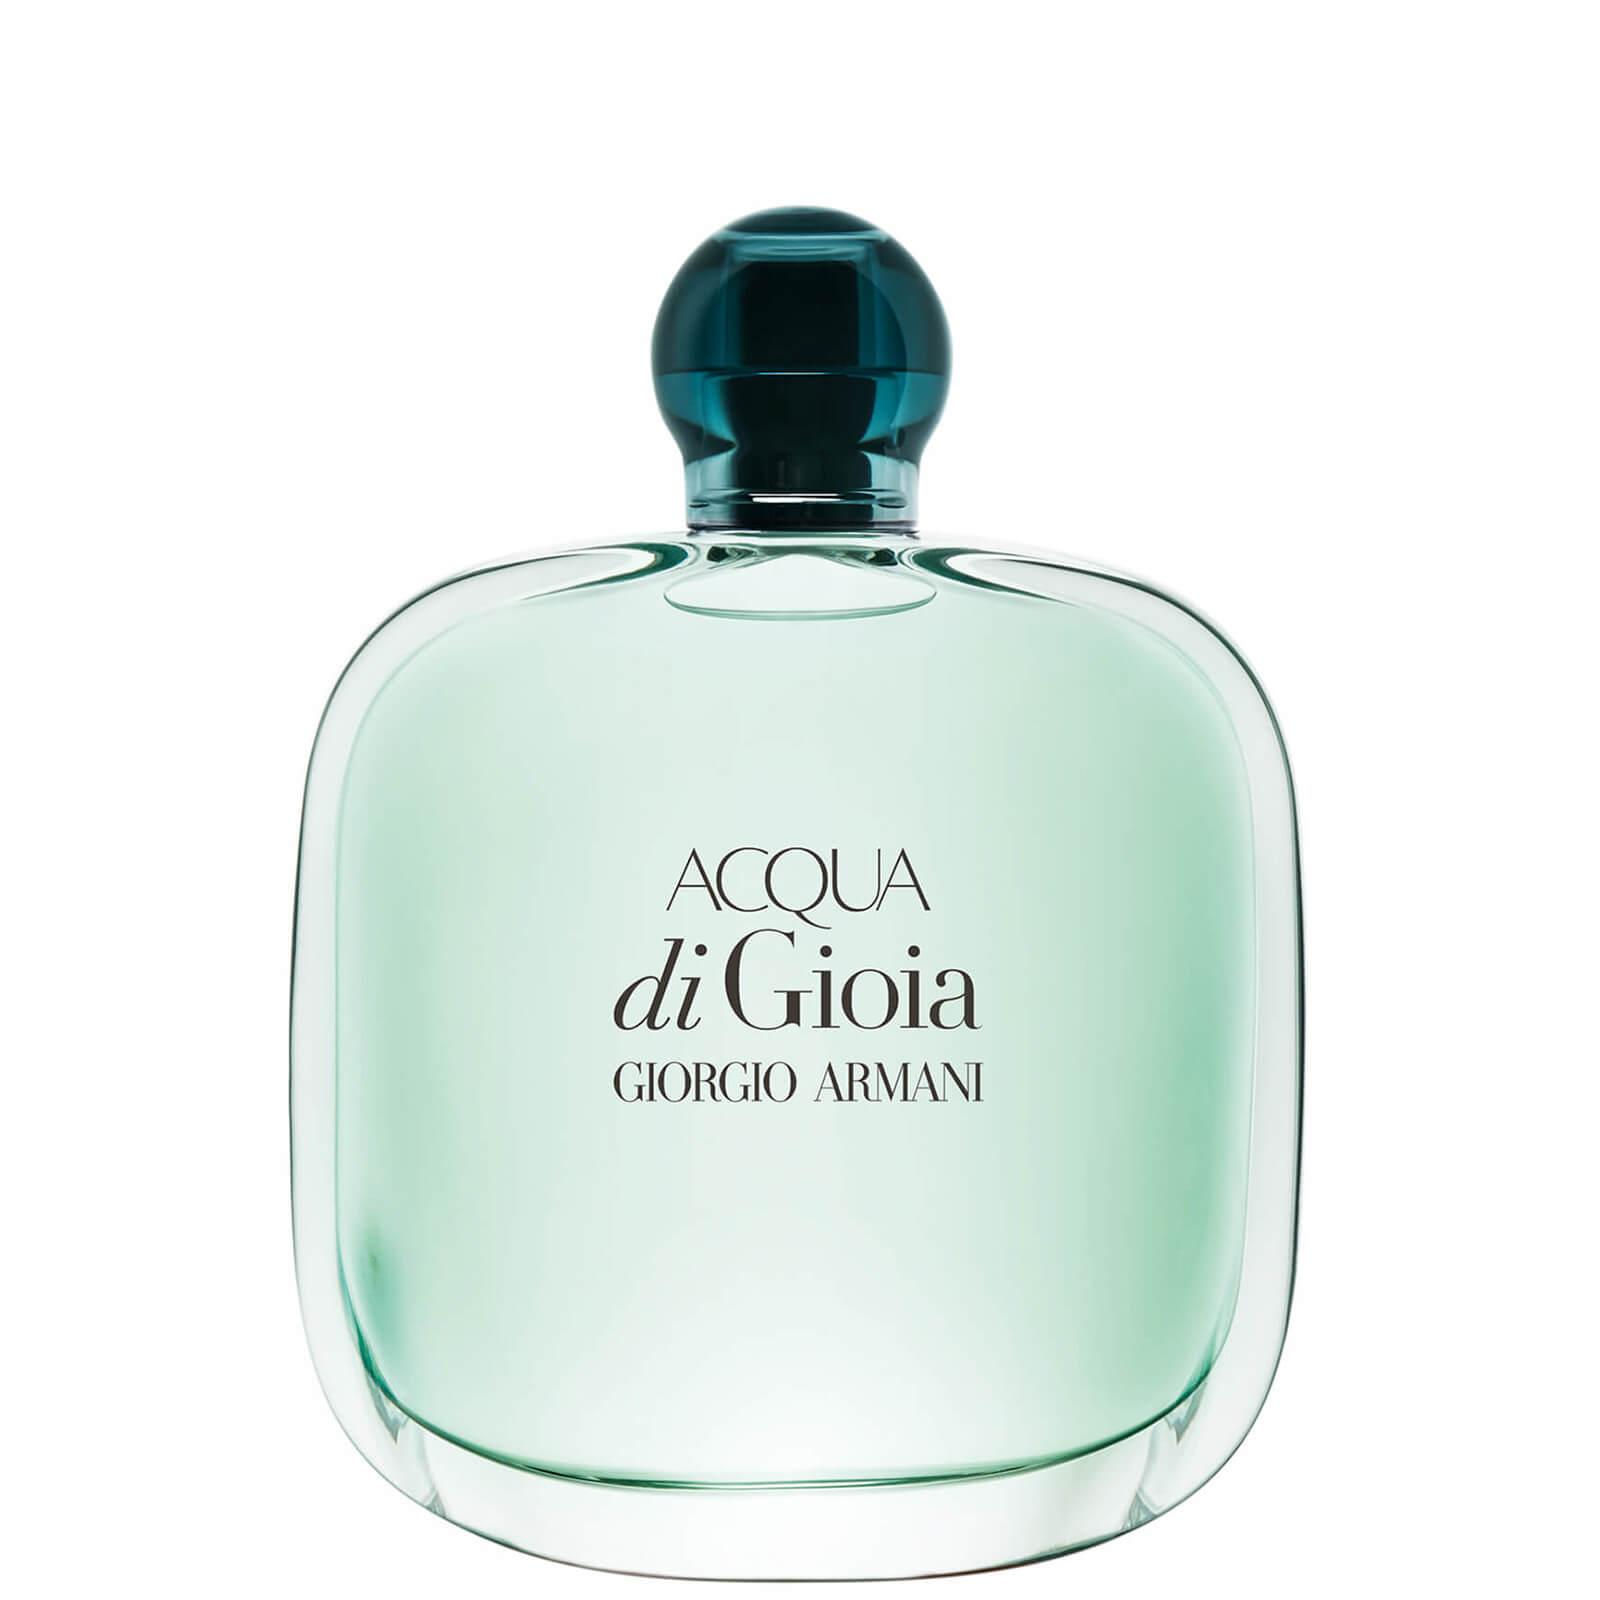 Image of Armani Acqua Di Gioia Eau de Parfum (Various Sizes) - 100ml